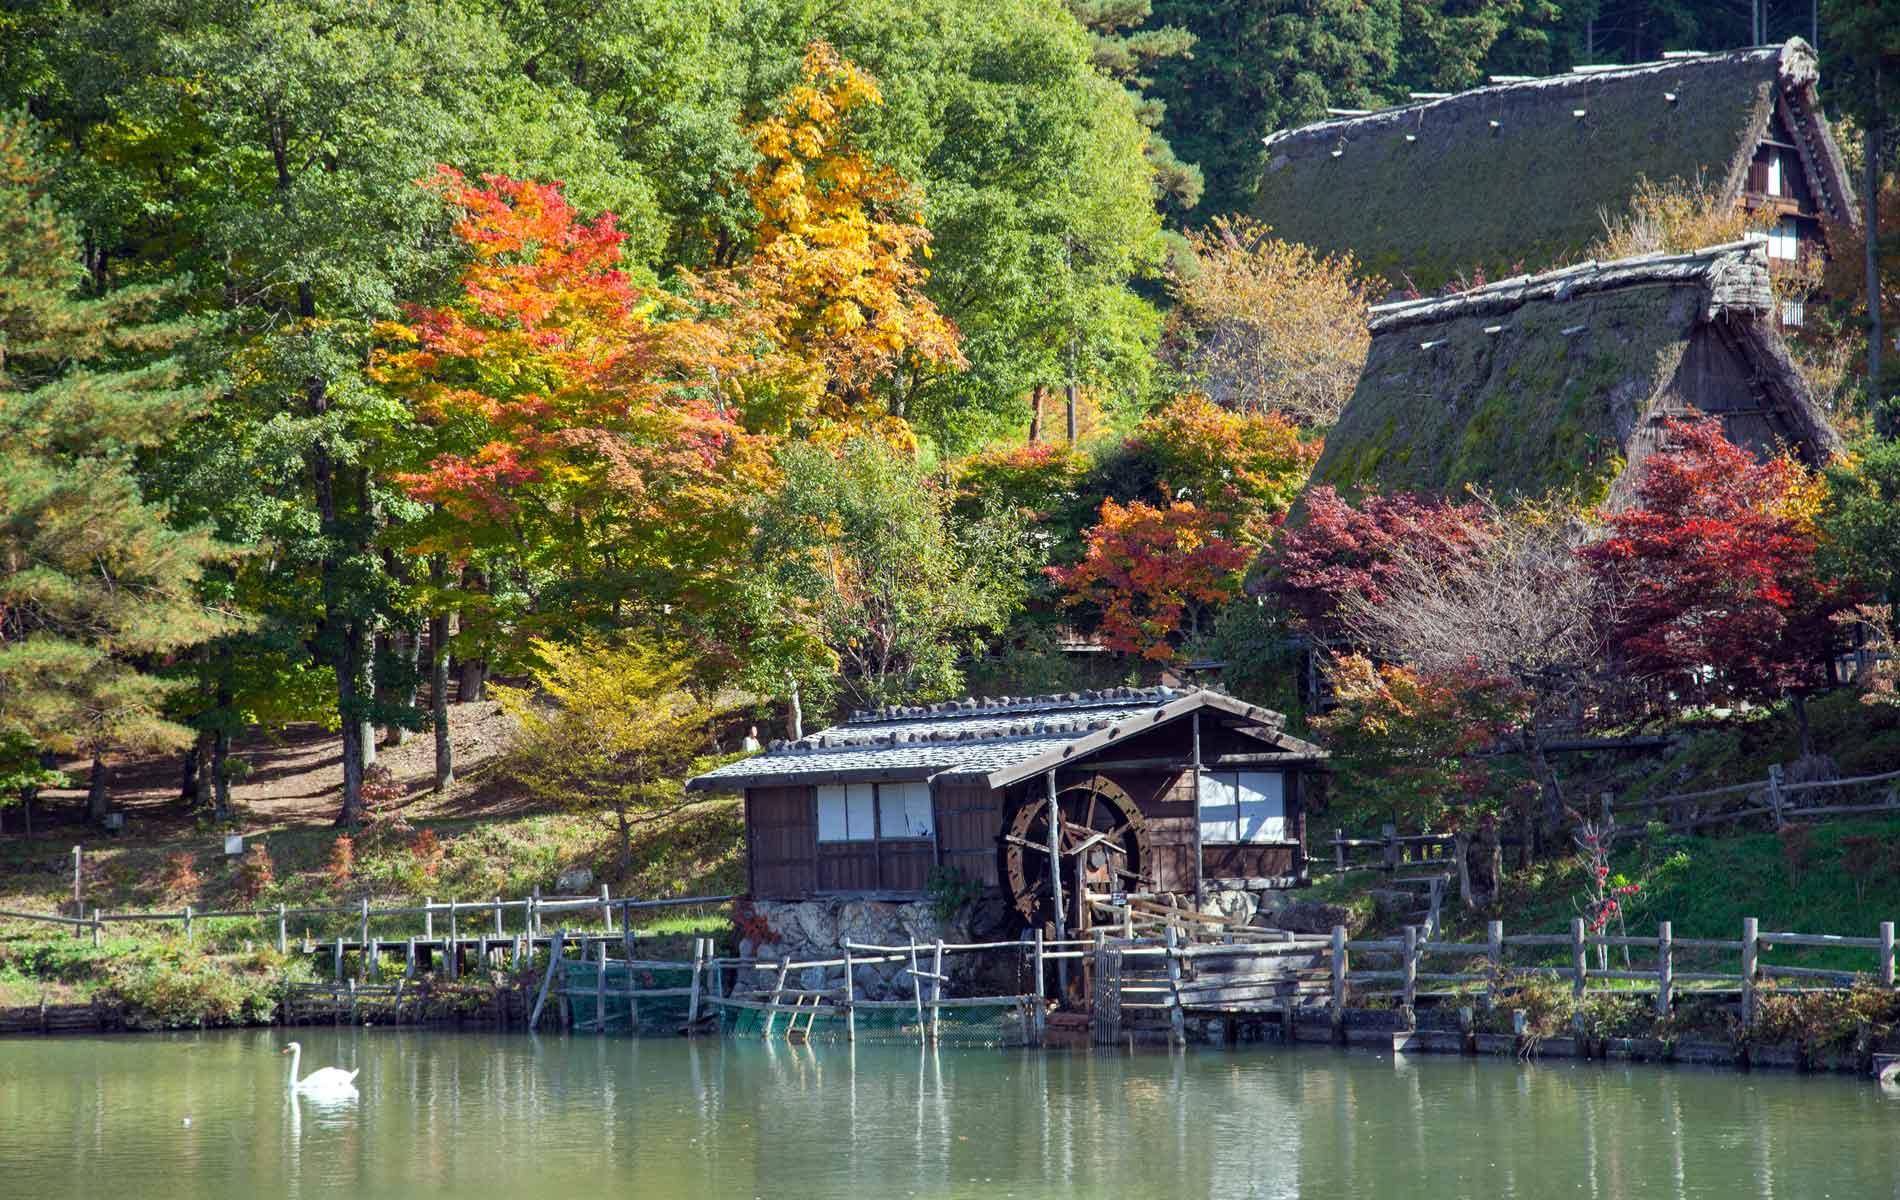 Colorful autumn trees in Hida Folk Village, Takayama, Japan